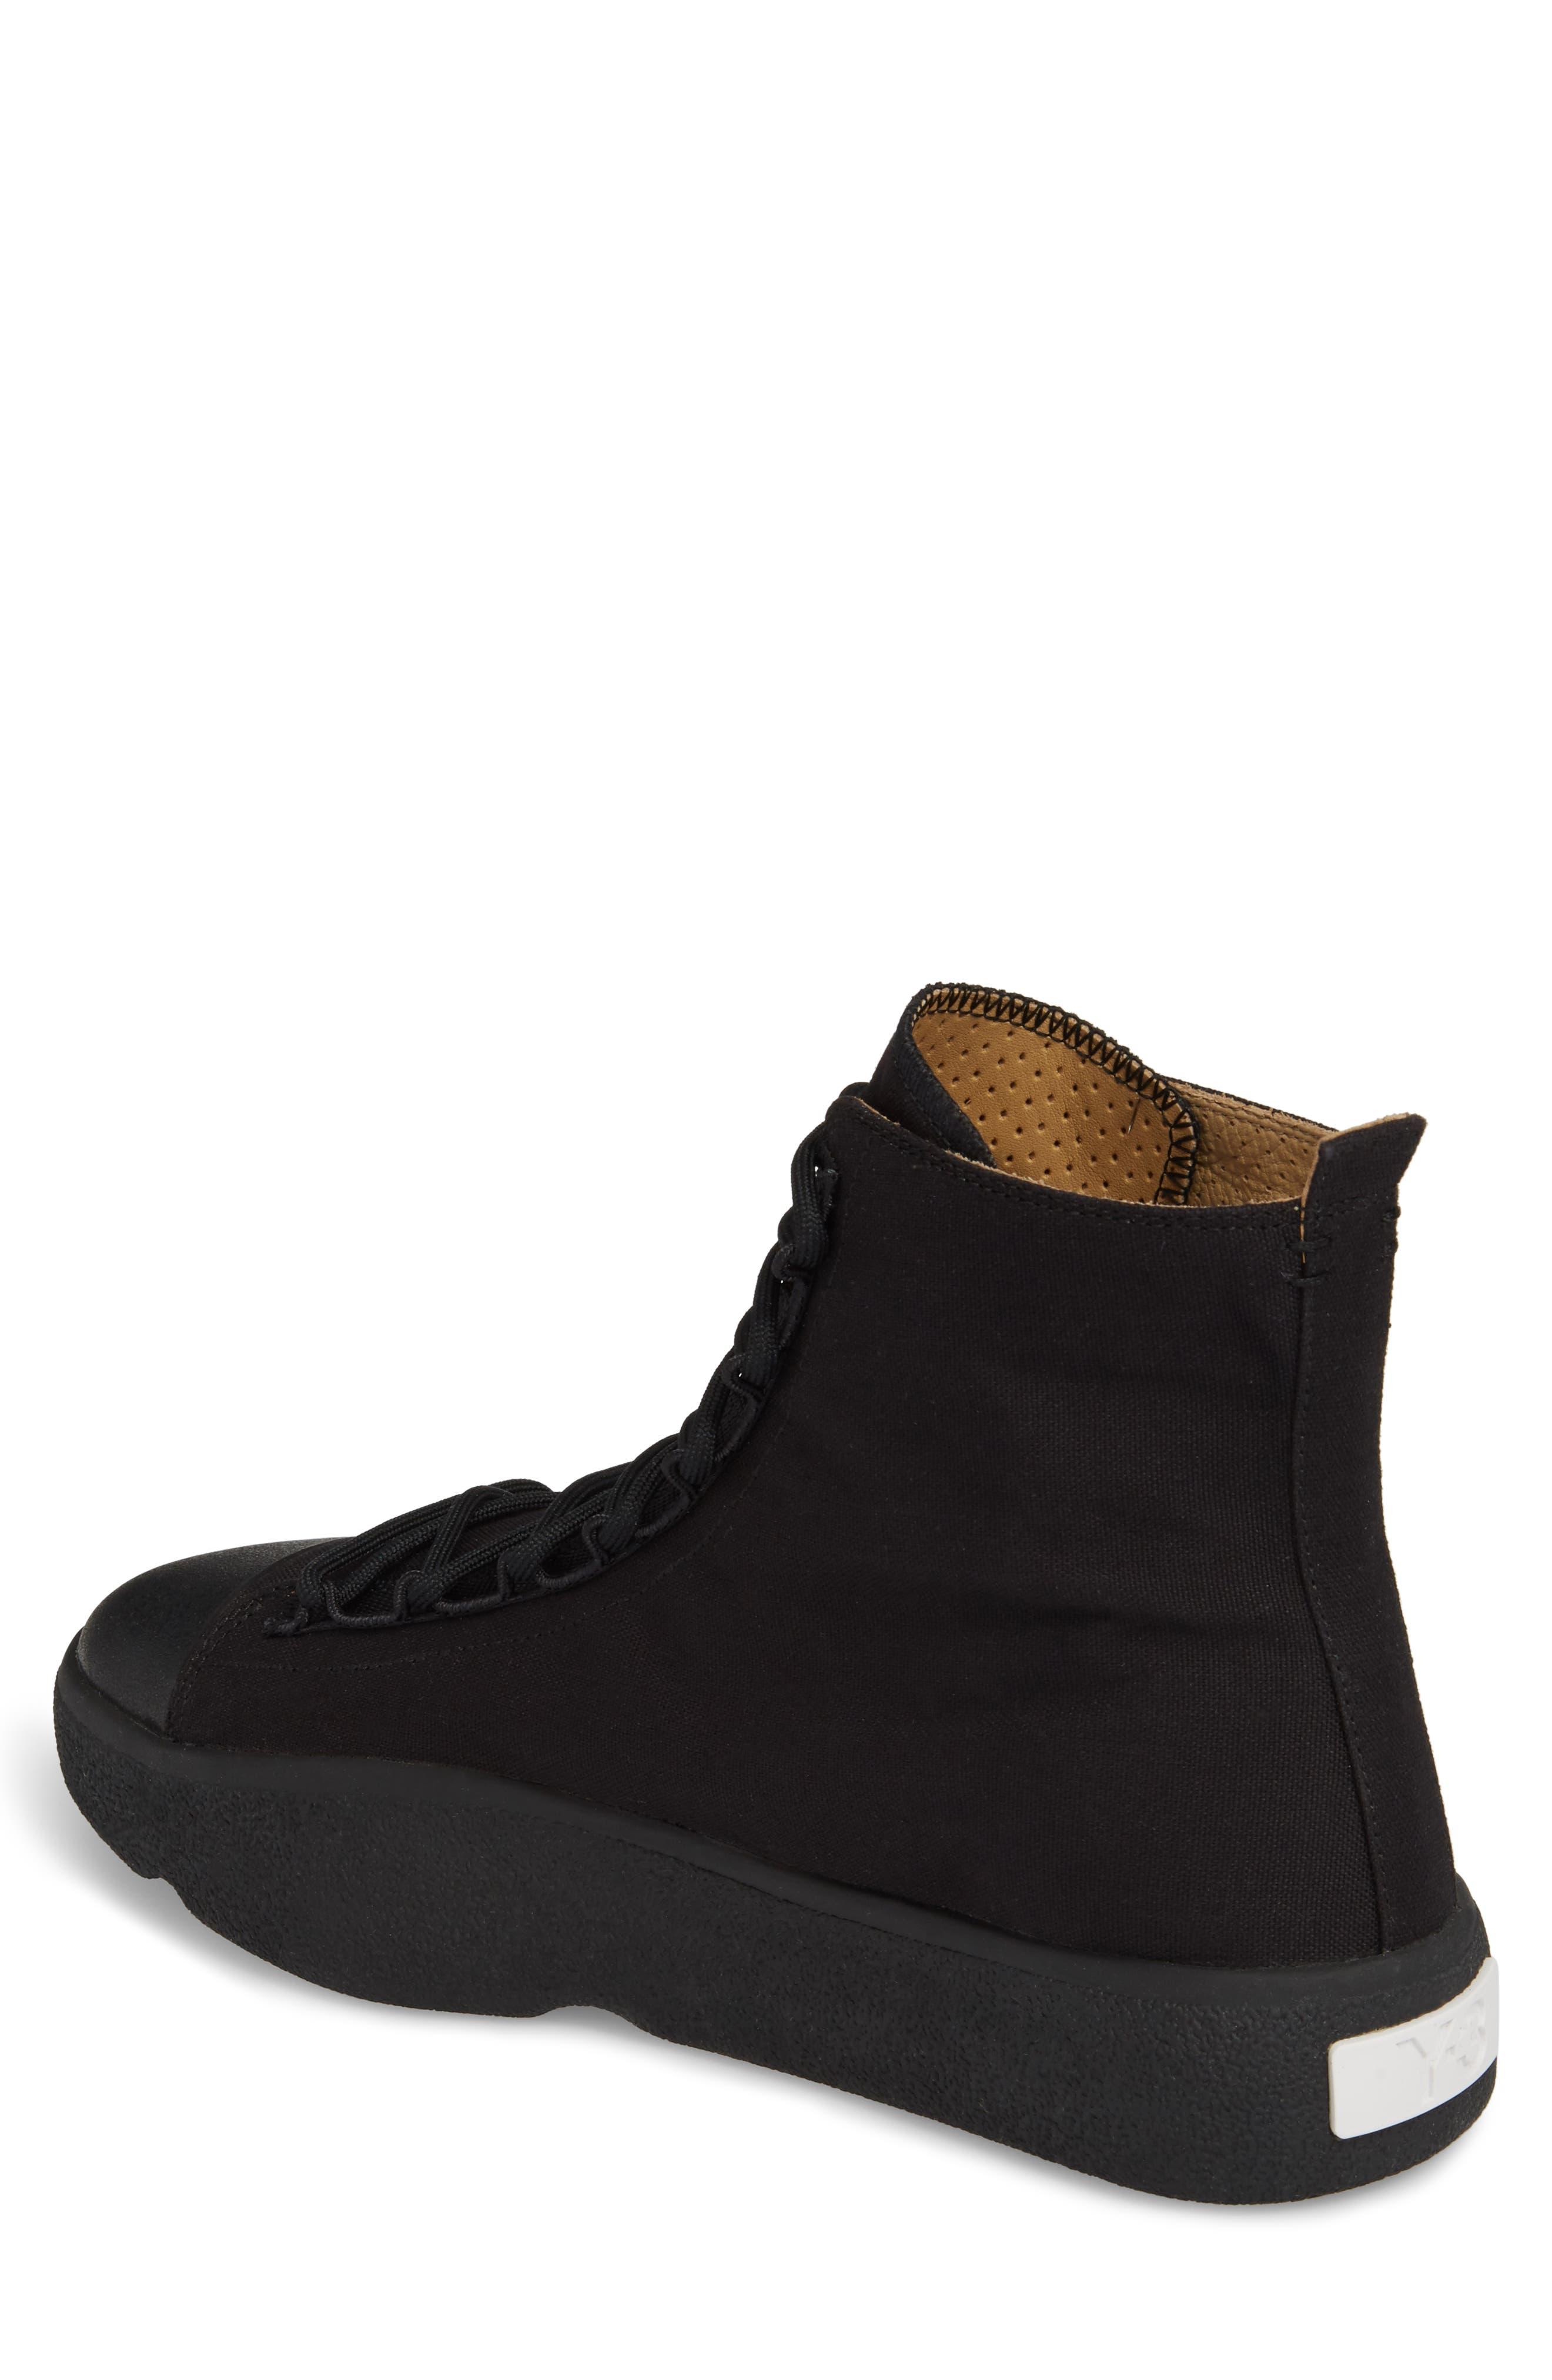 x adidas Bashyo High Top Sneaker,                             Alternate thumbnail 2, color,                             001